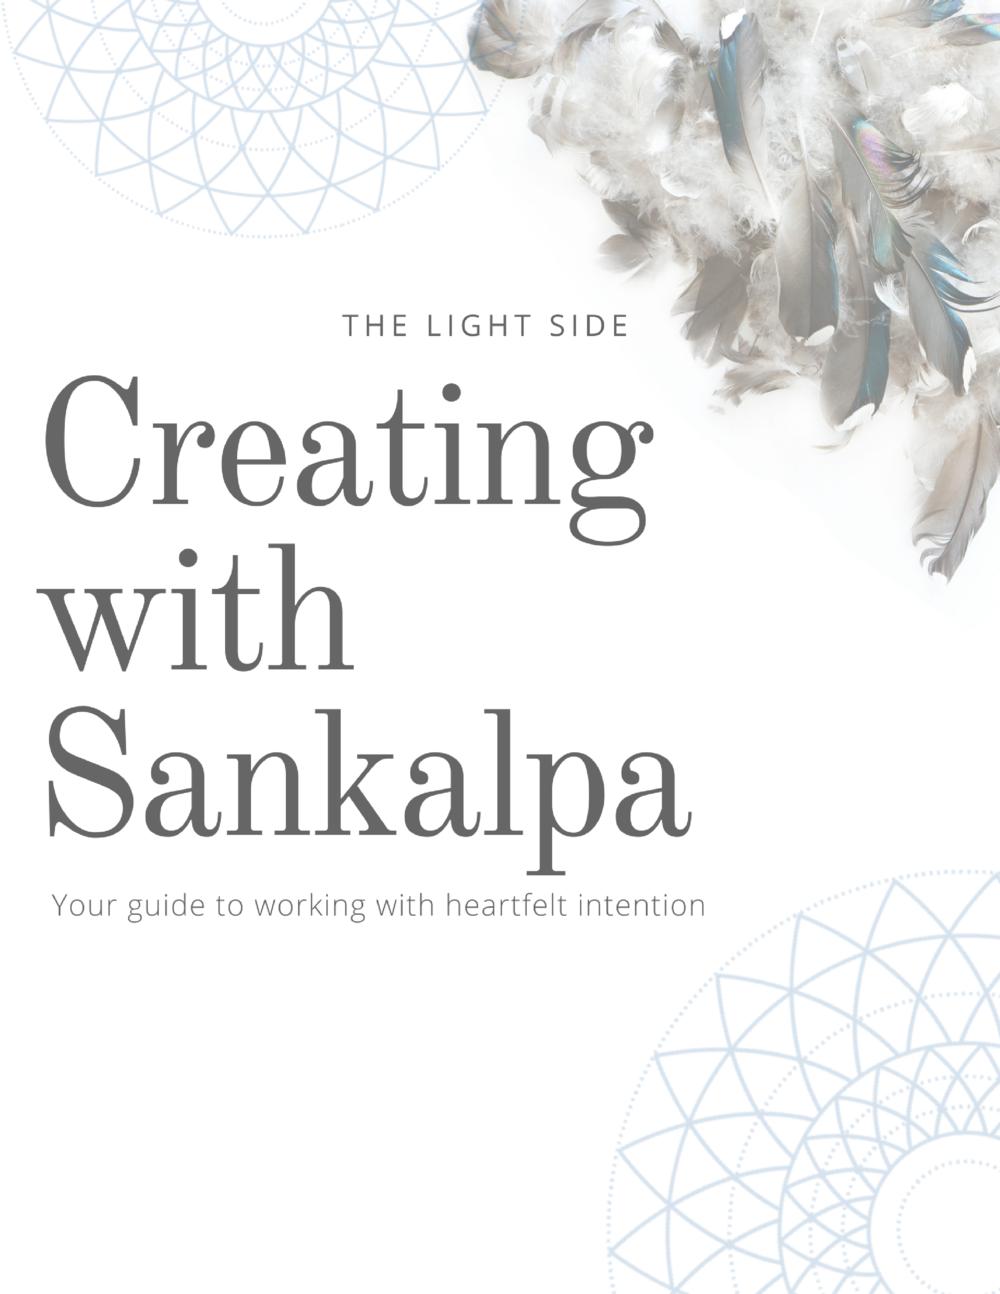 creating with sankalpa pg 1.png